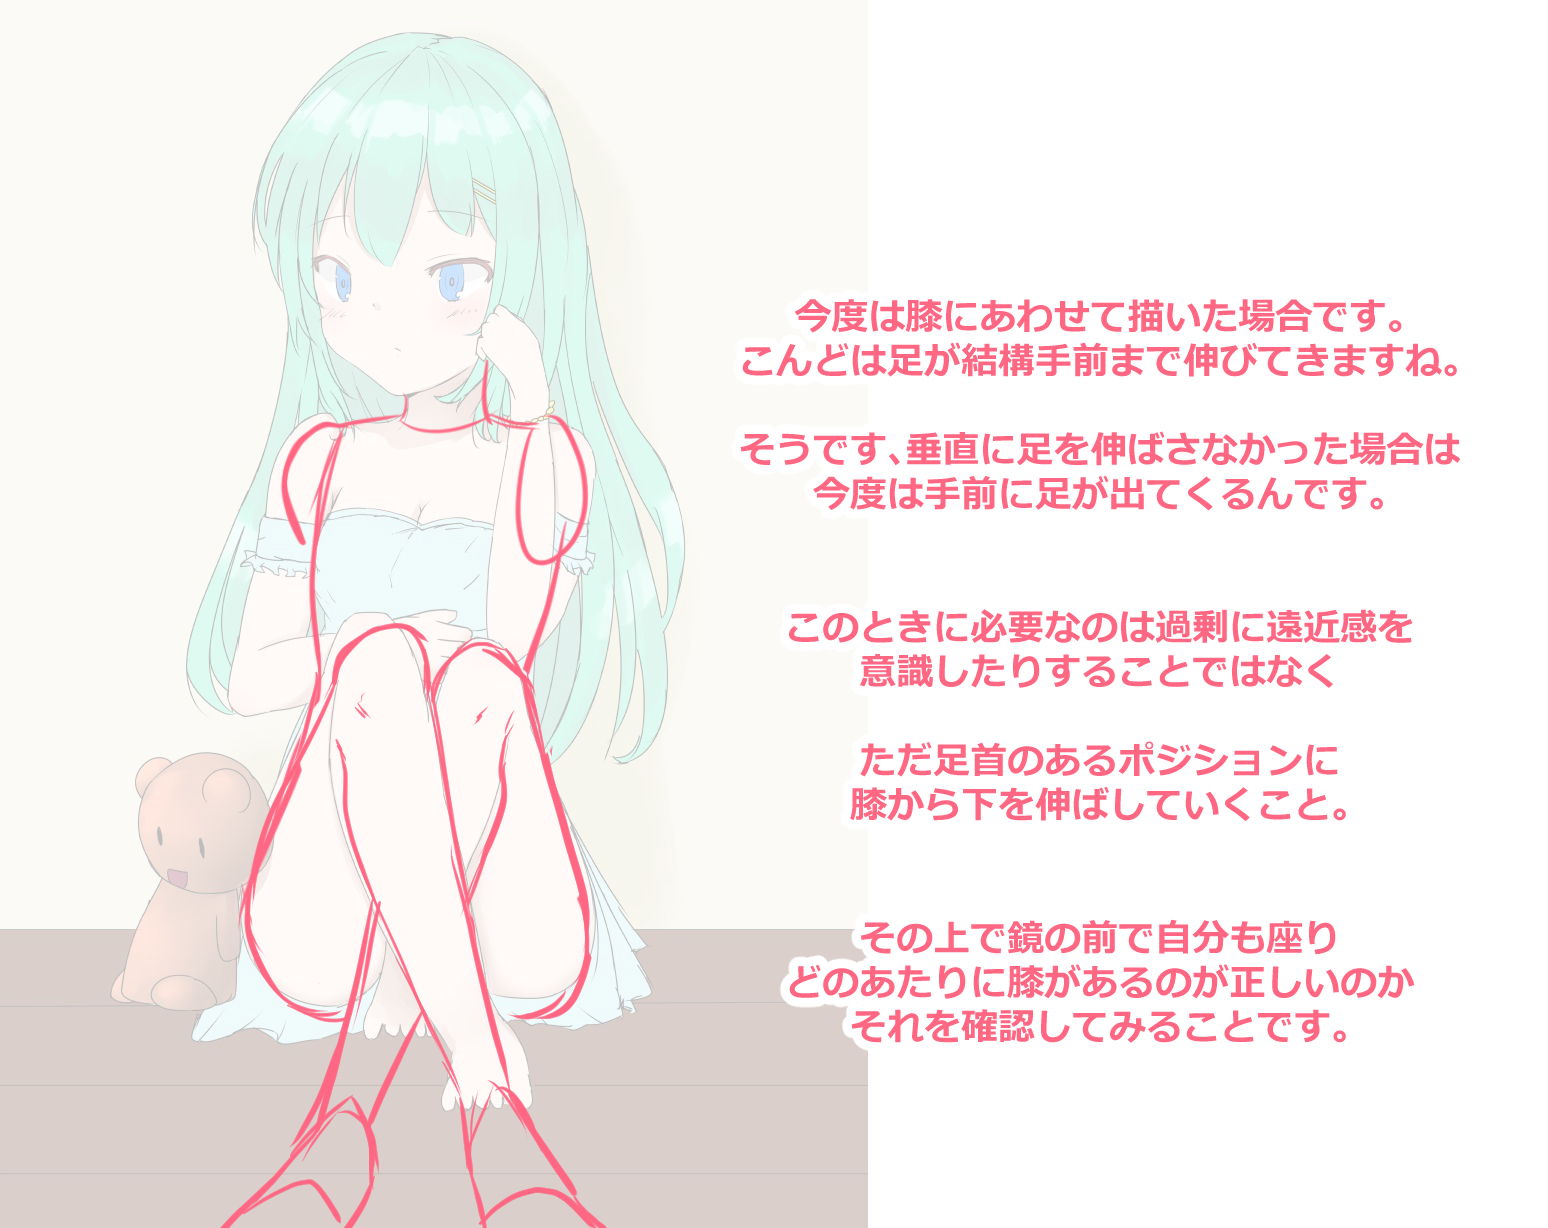 H2qkrzm8_3.jpg